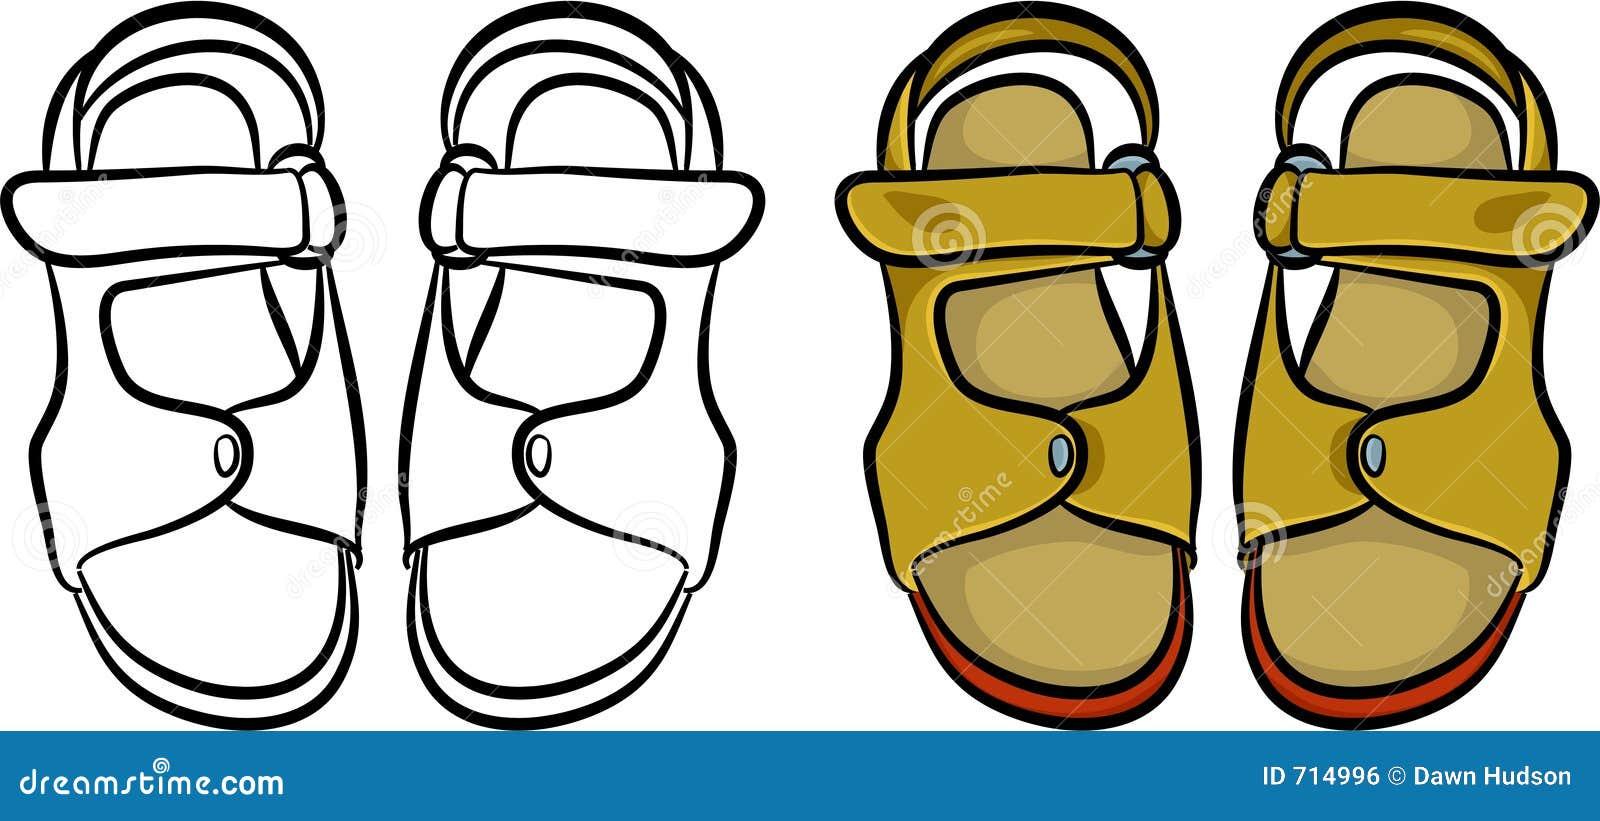 24b75e4d47c8a Mens sandals stock illustration. Illustration of clipart - 714996